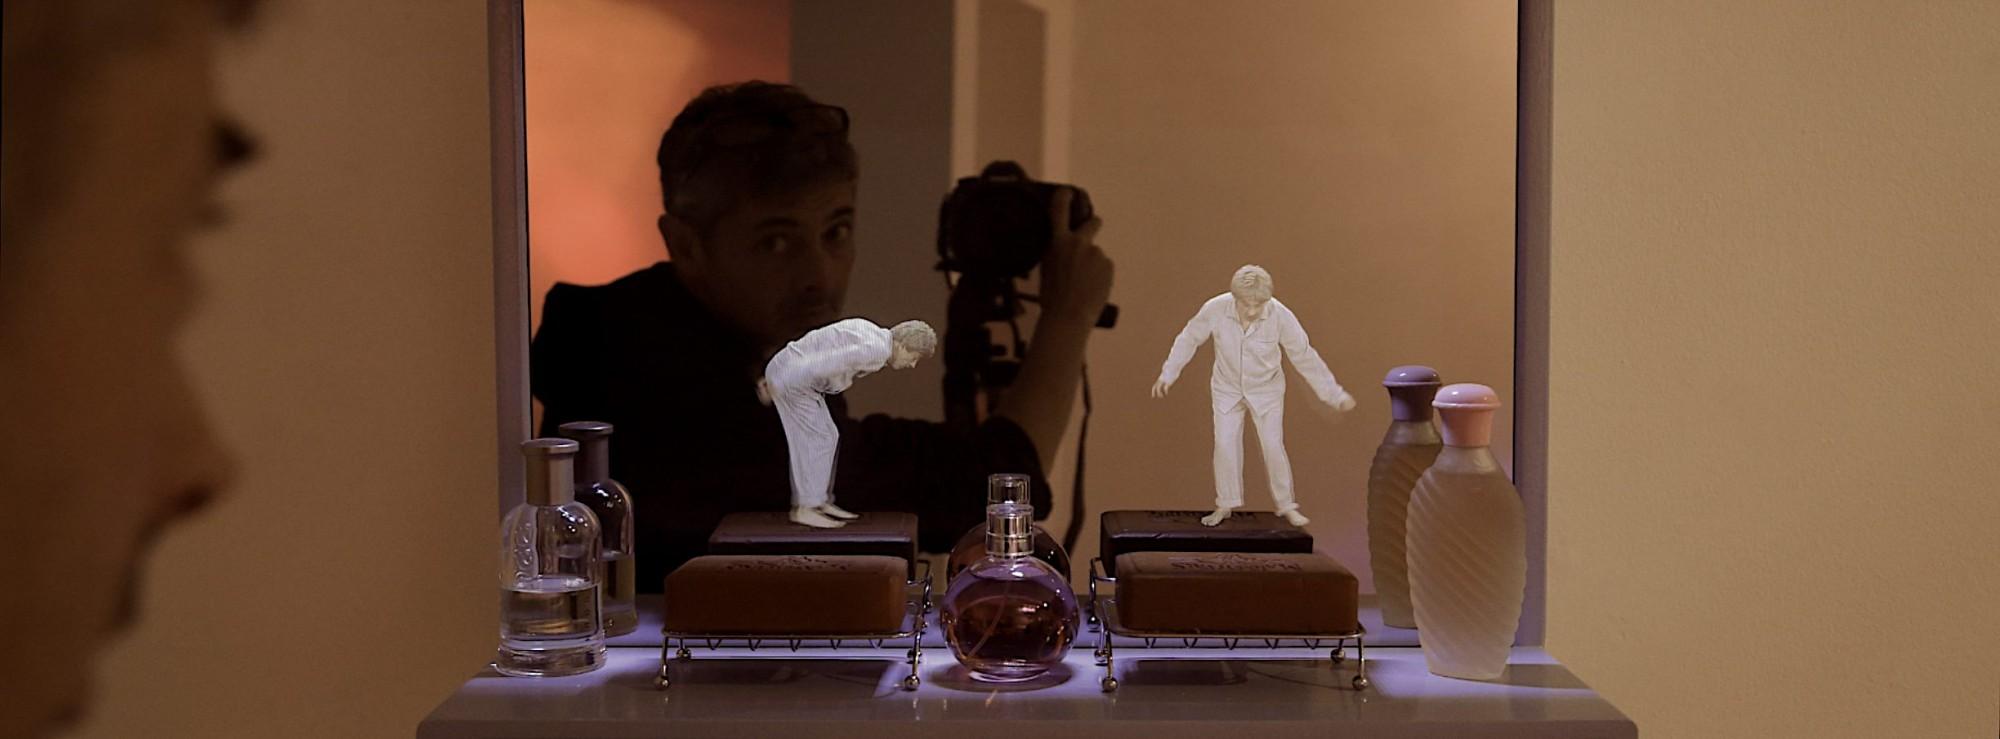 Pierrick Sorin - Chorégraphie au savon